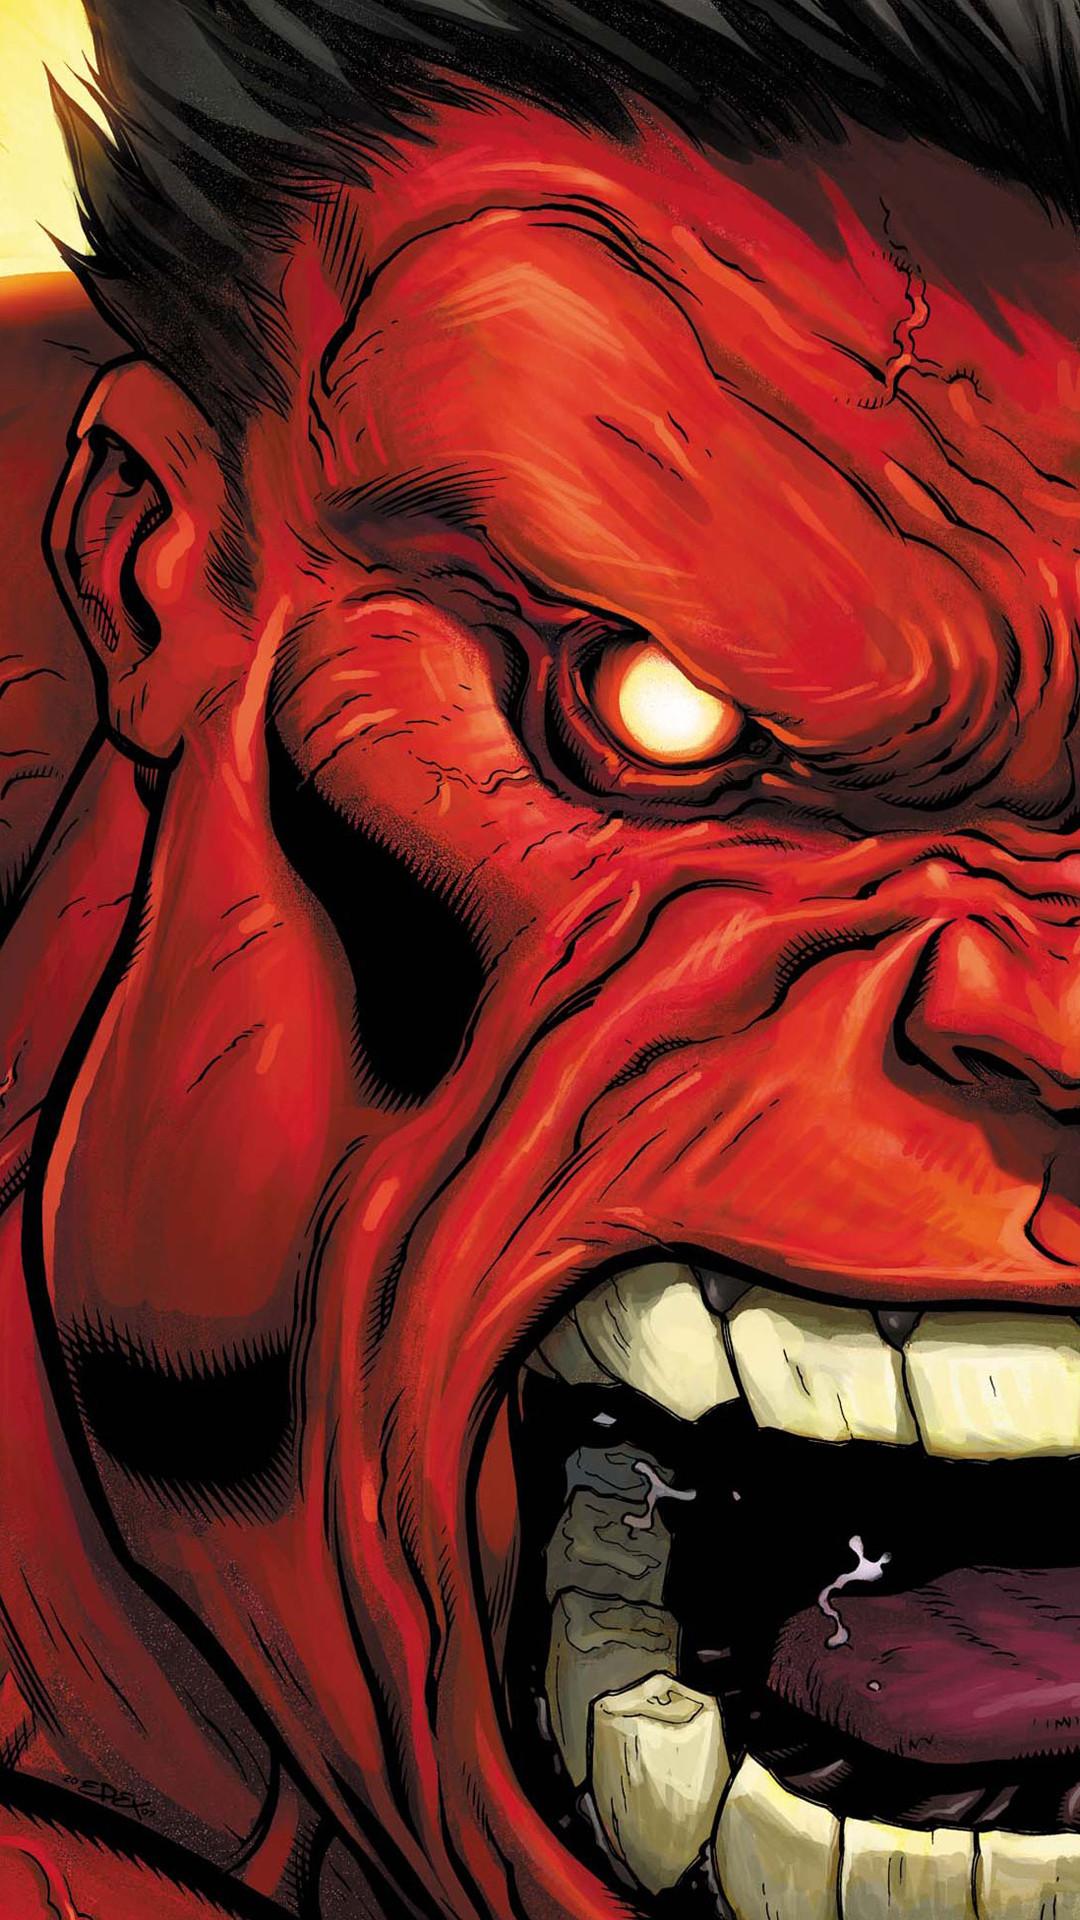 Hulk red face HTC hd wallpaper – Best htc one wallpapers